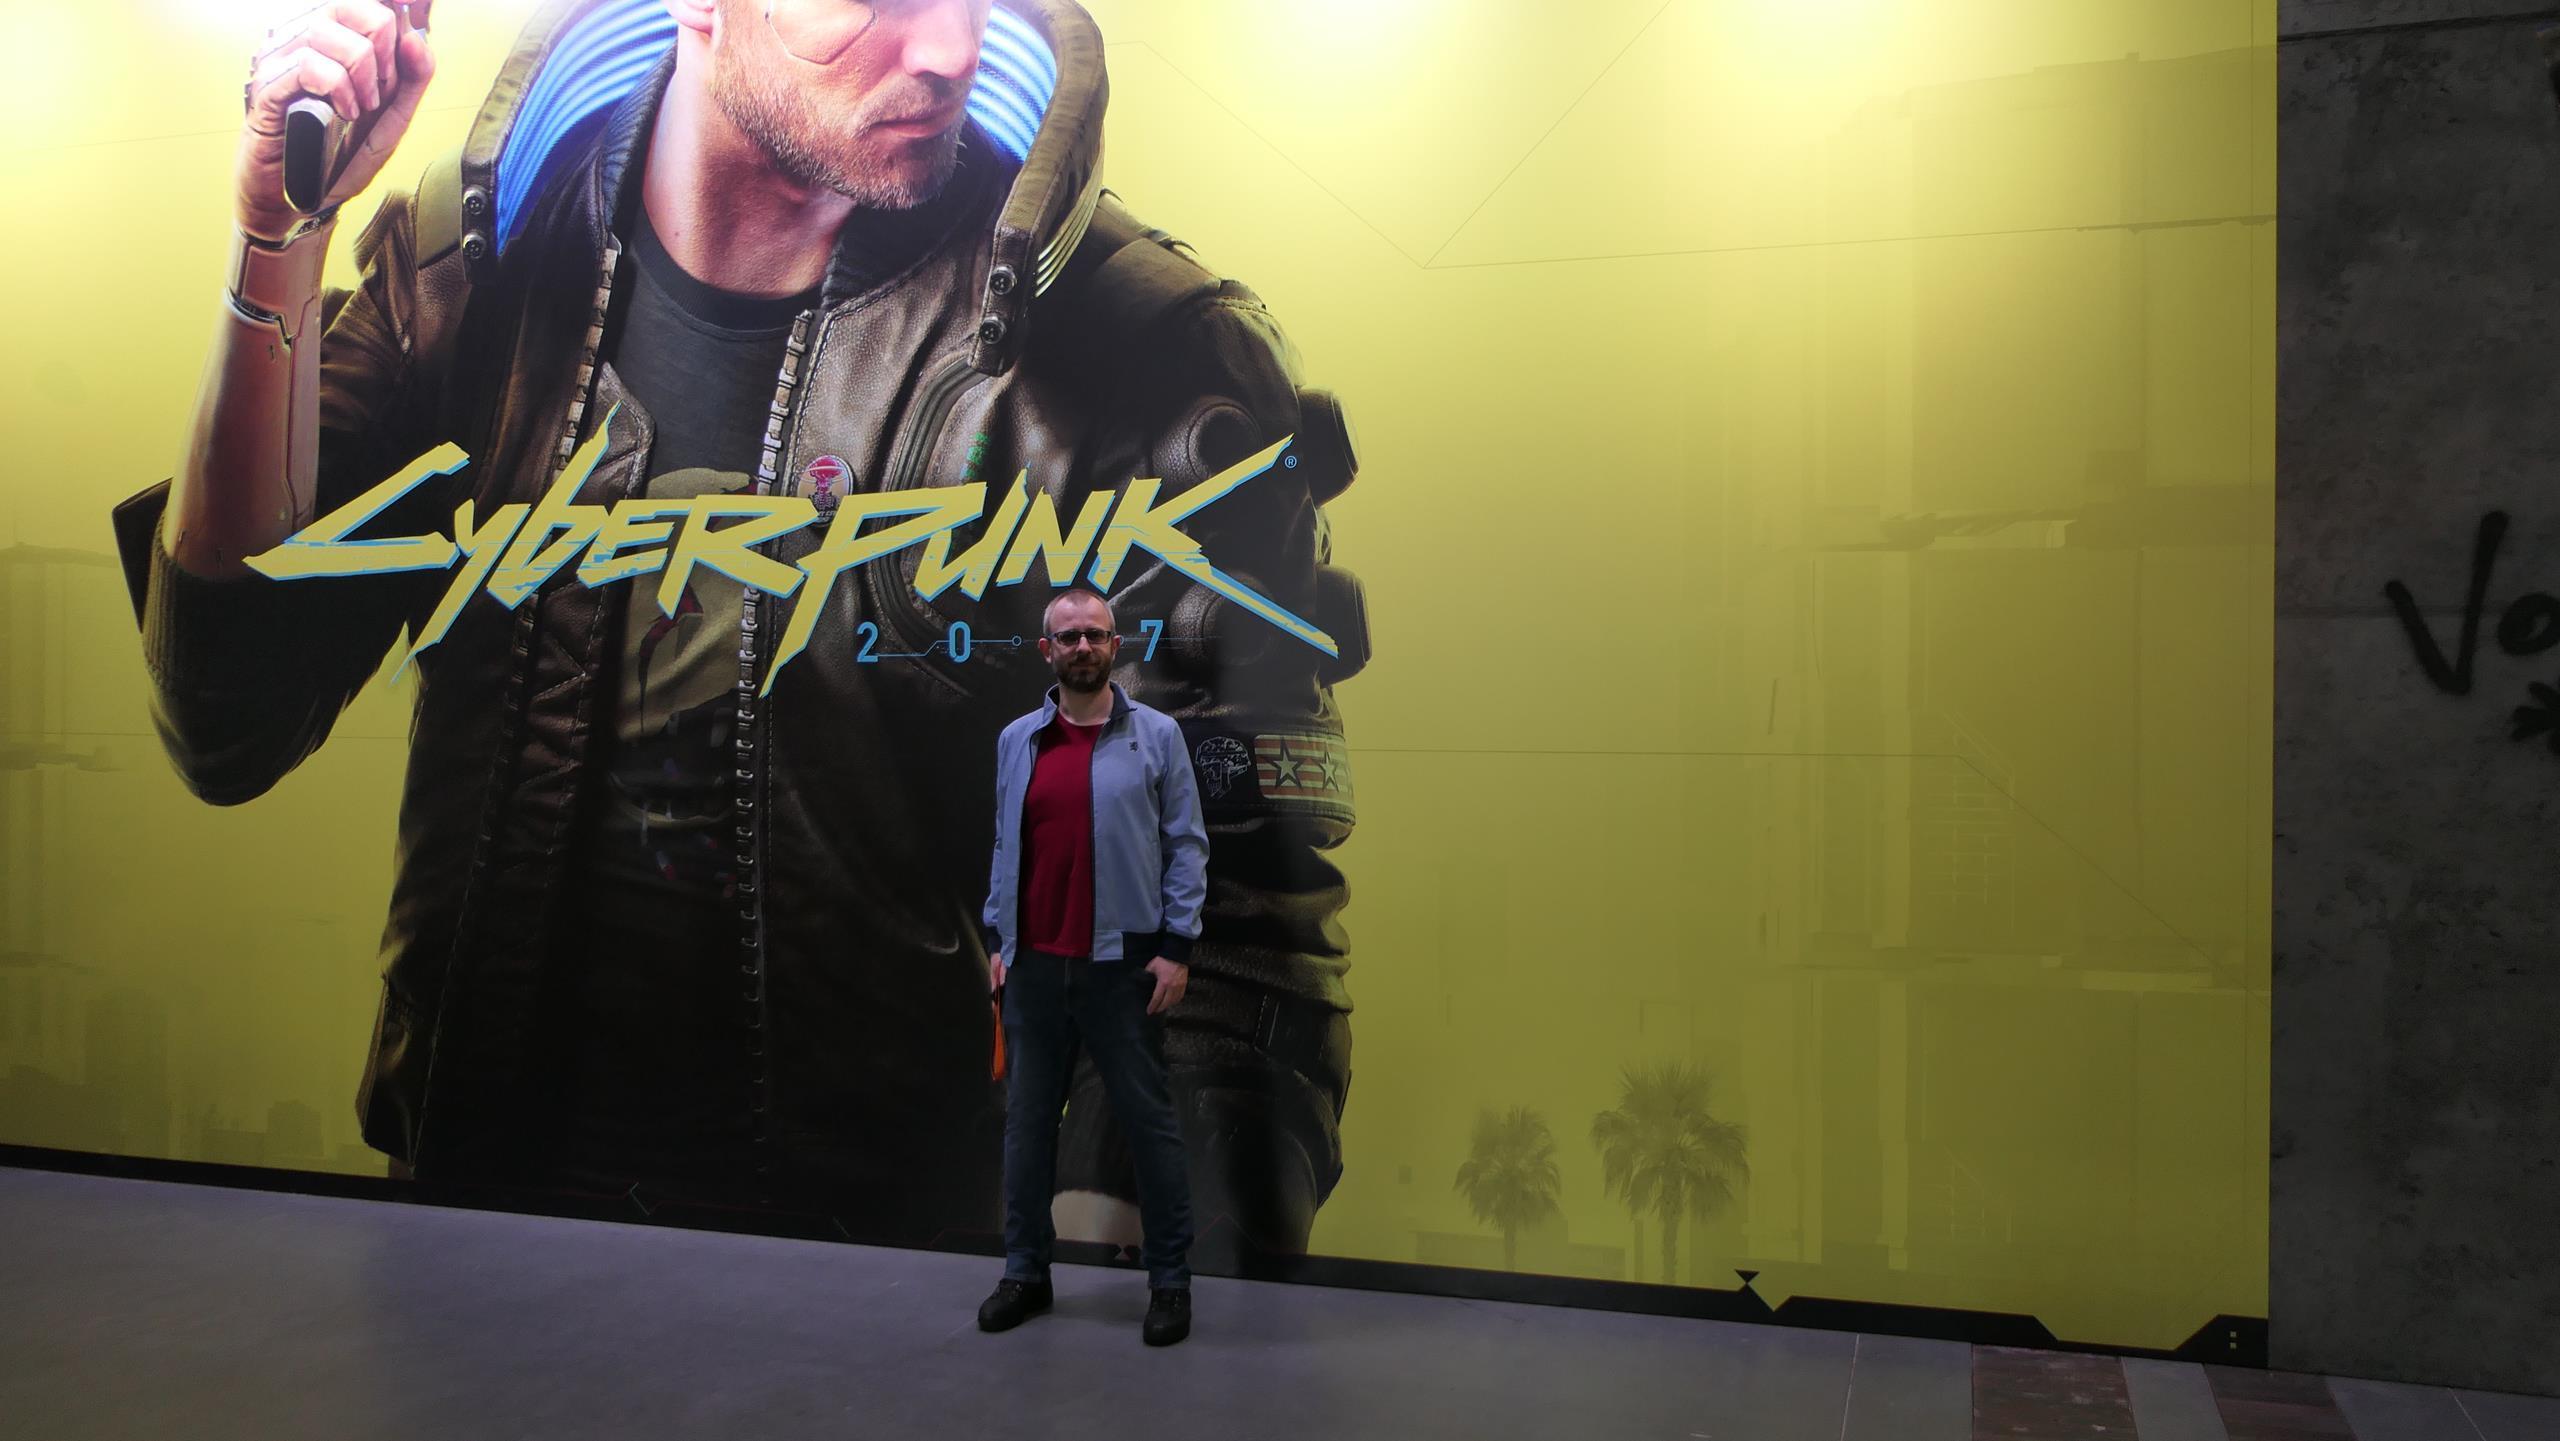 Cyberpunk 2077 - pawilon 7A